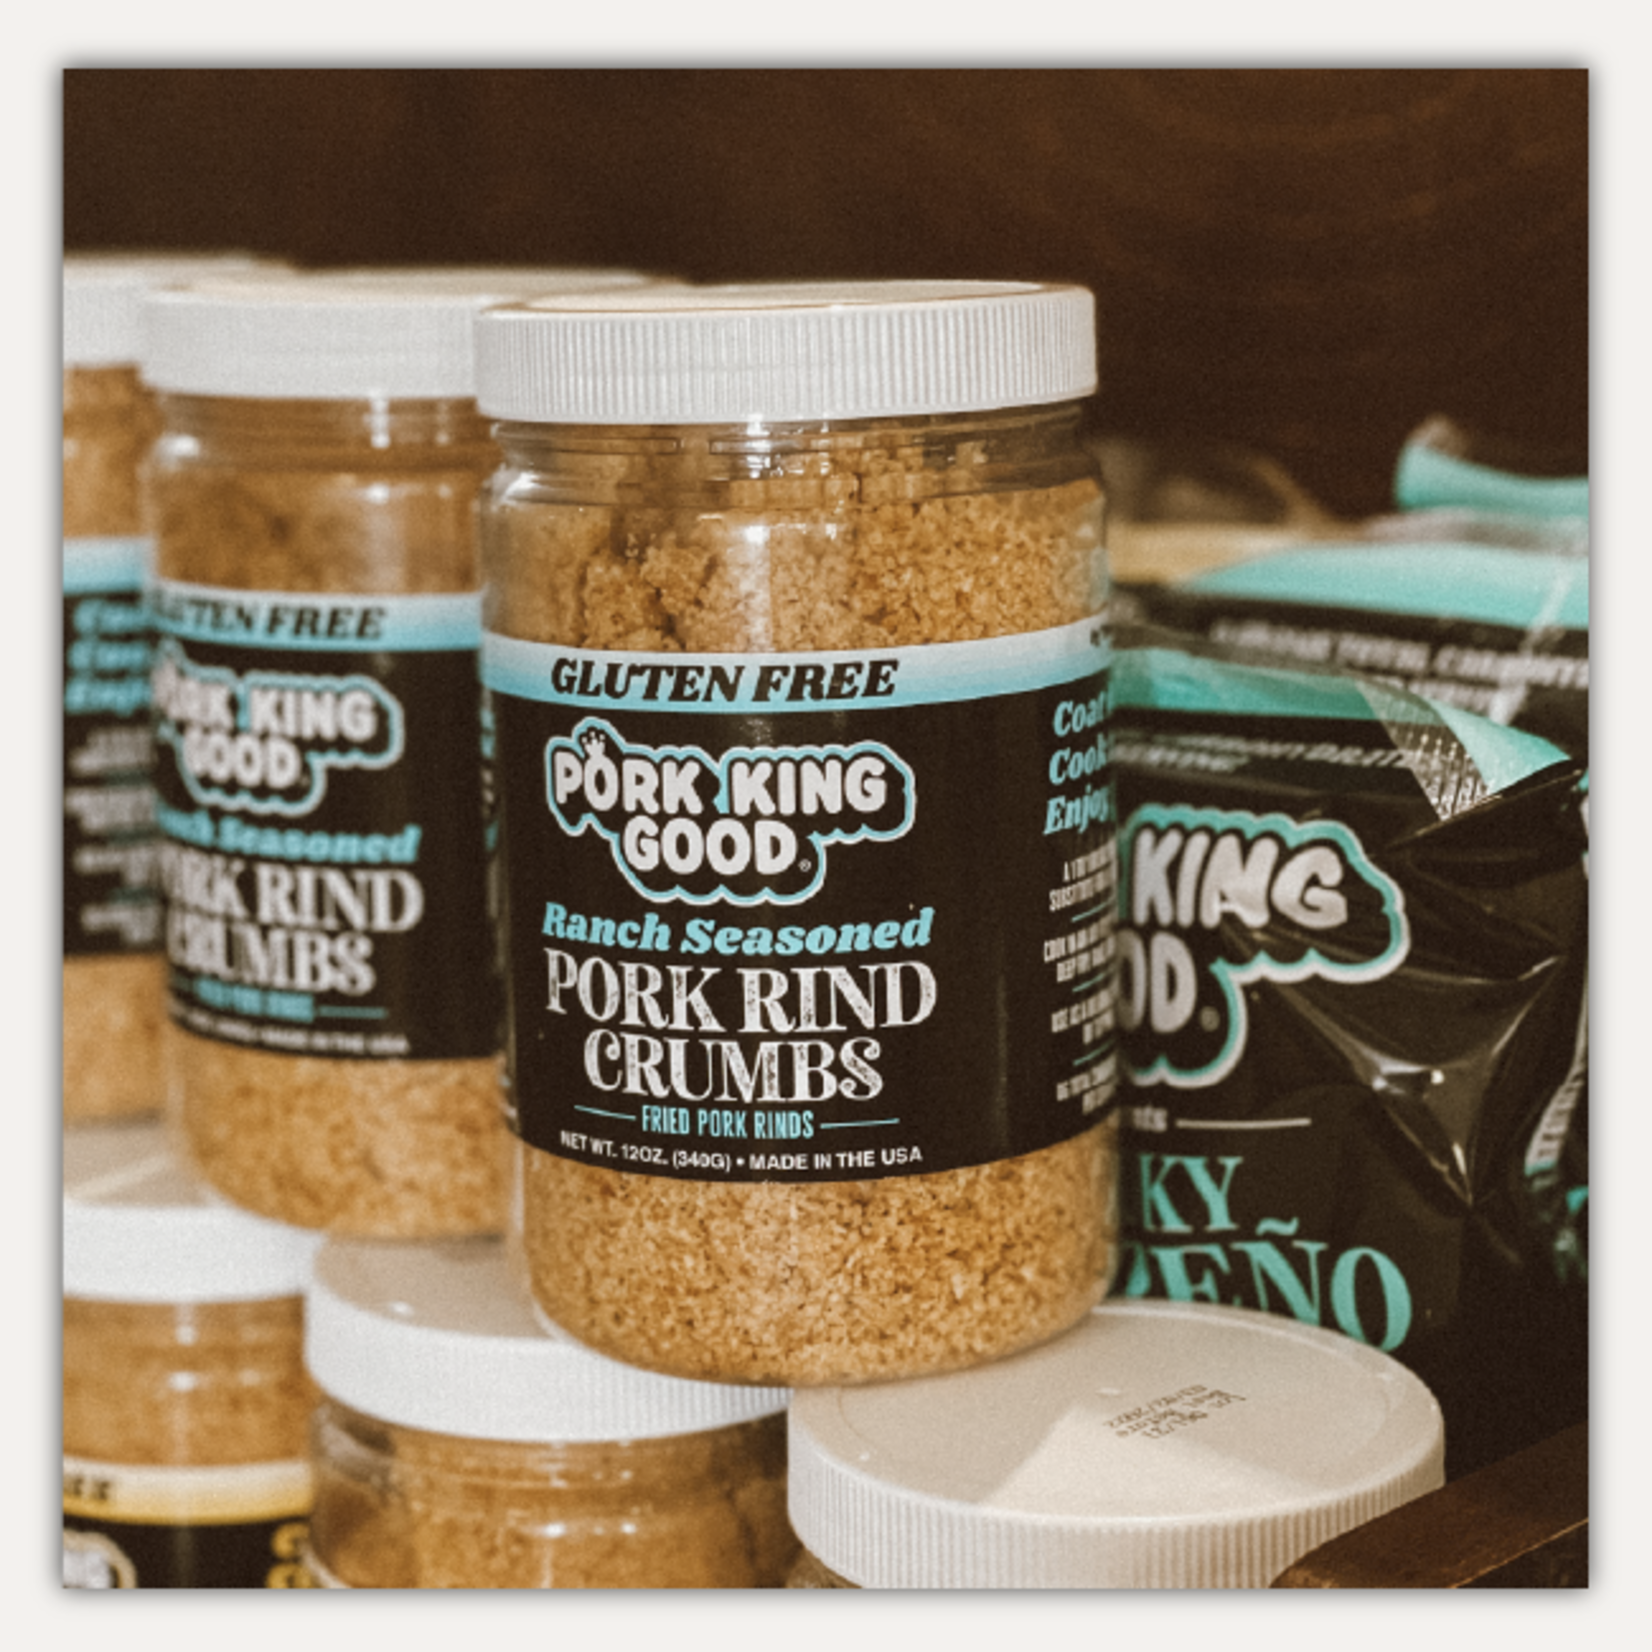 Pork King Good Ranch Pork Rind Crumbs